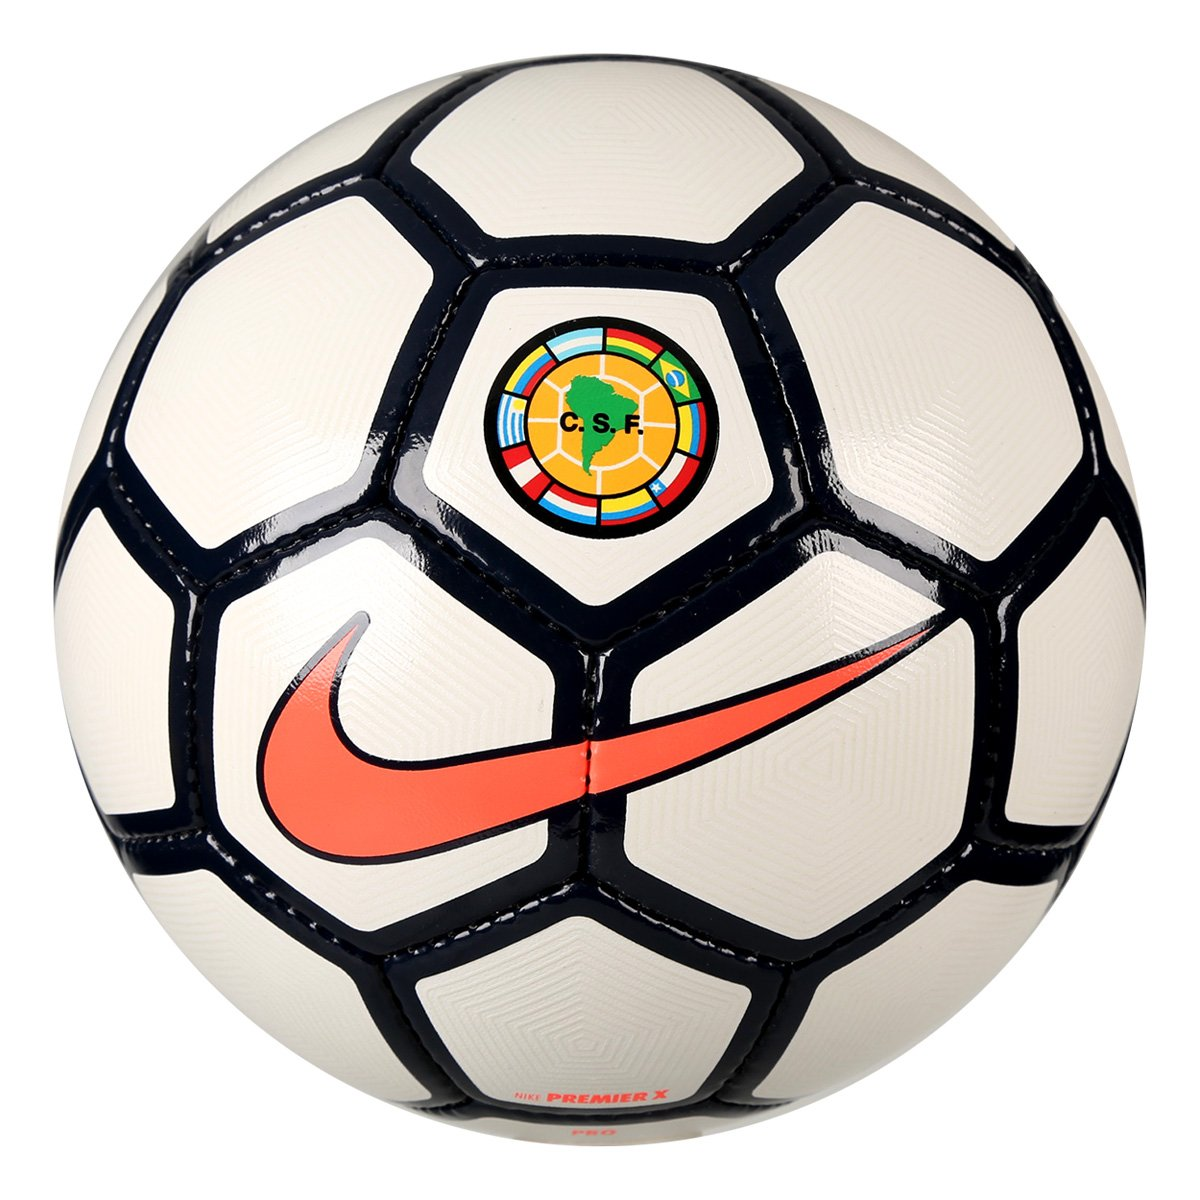 9d124f3465 Bola Futsal Nike CSF Premier FootballX - Compre Agora